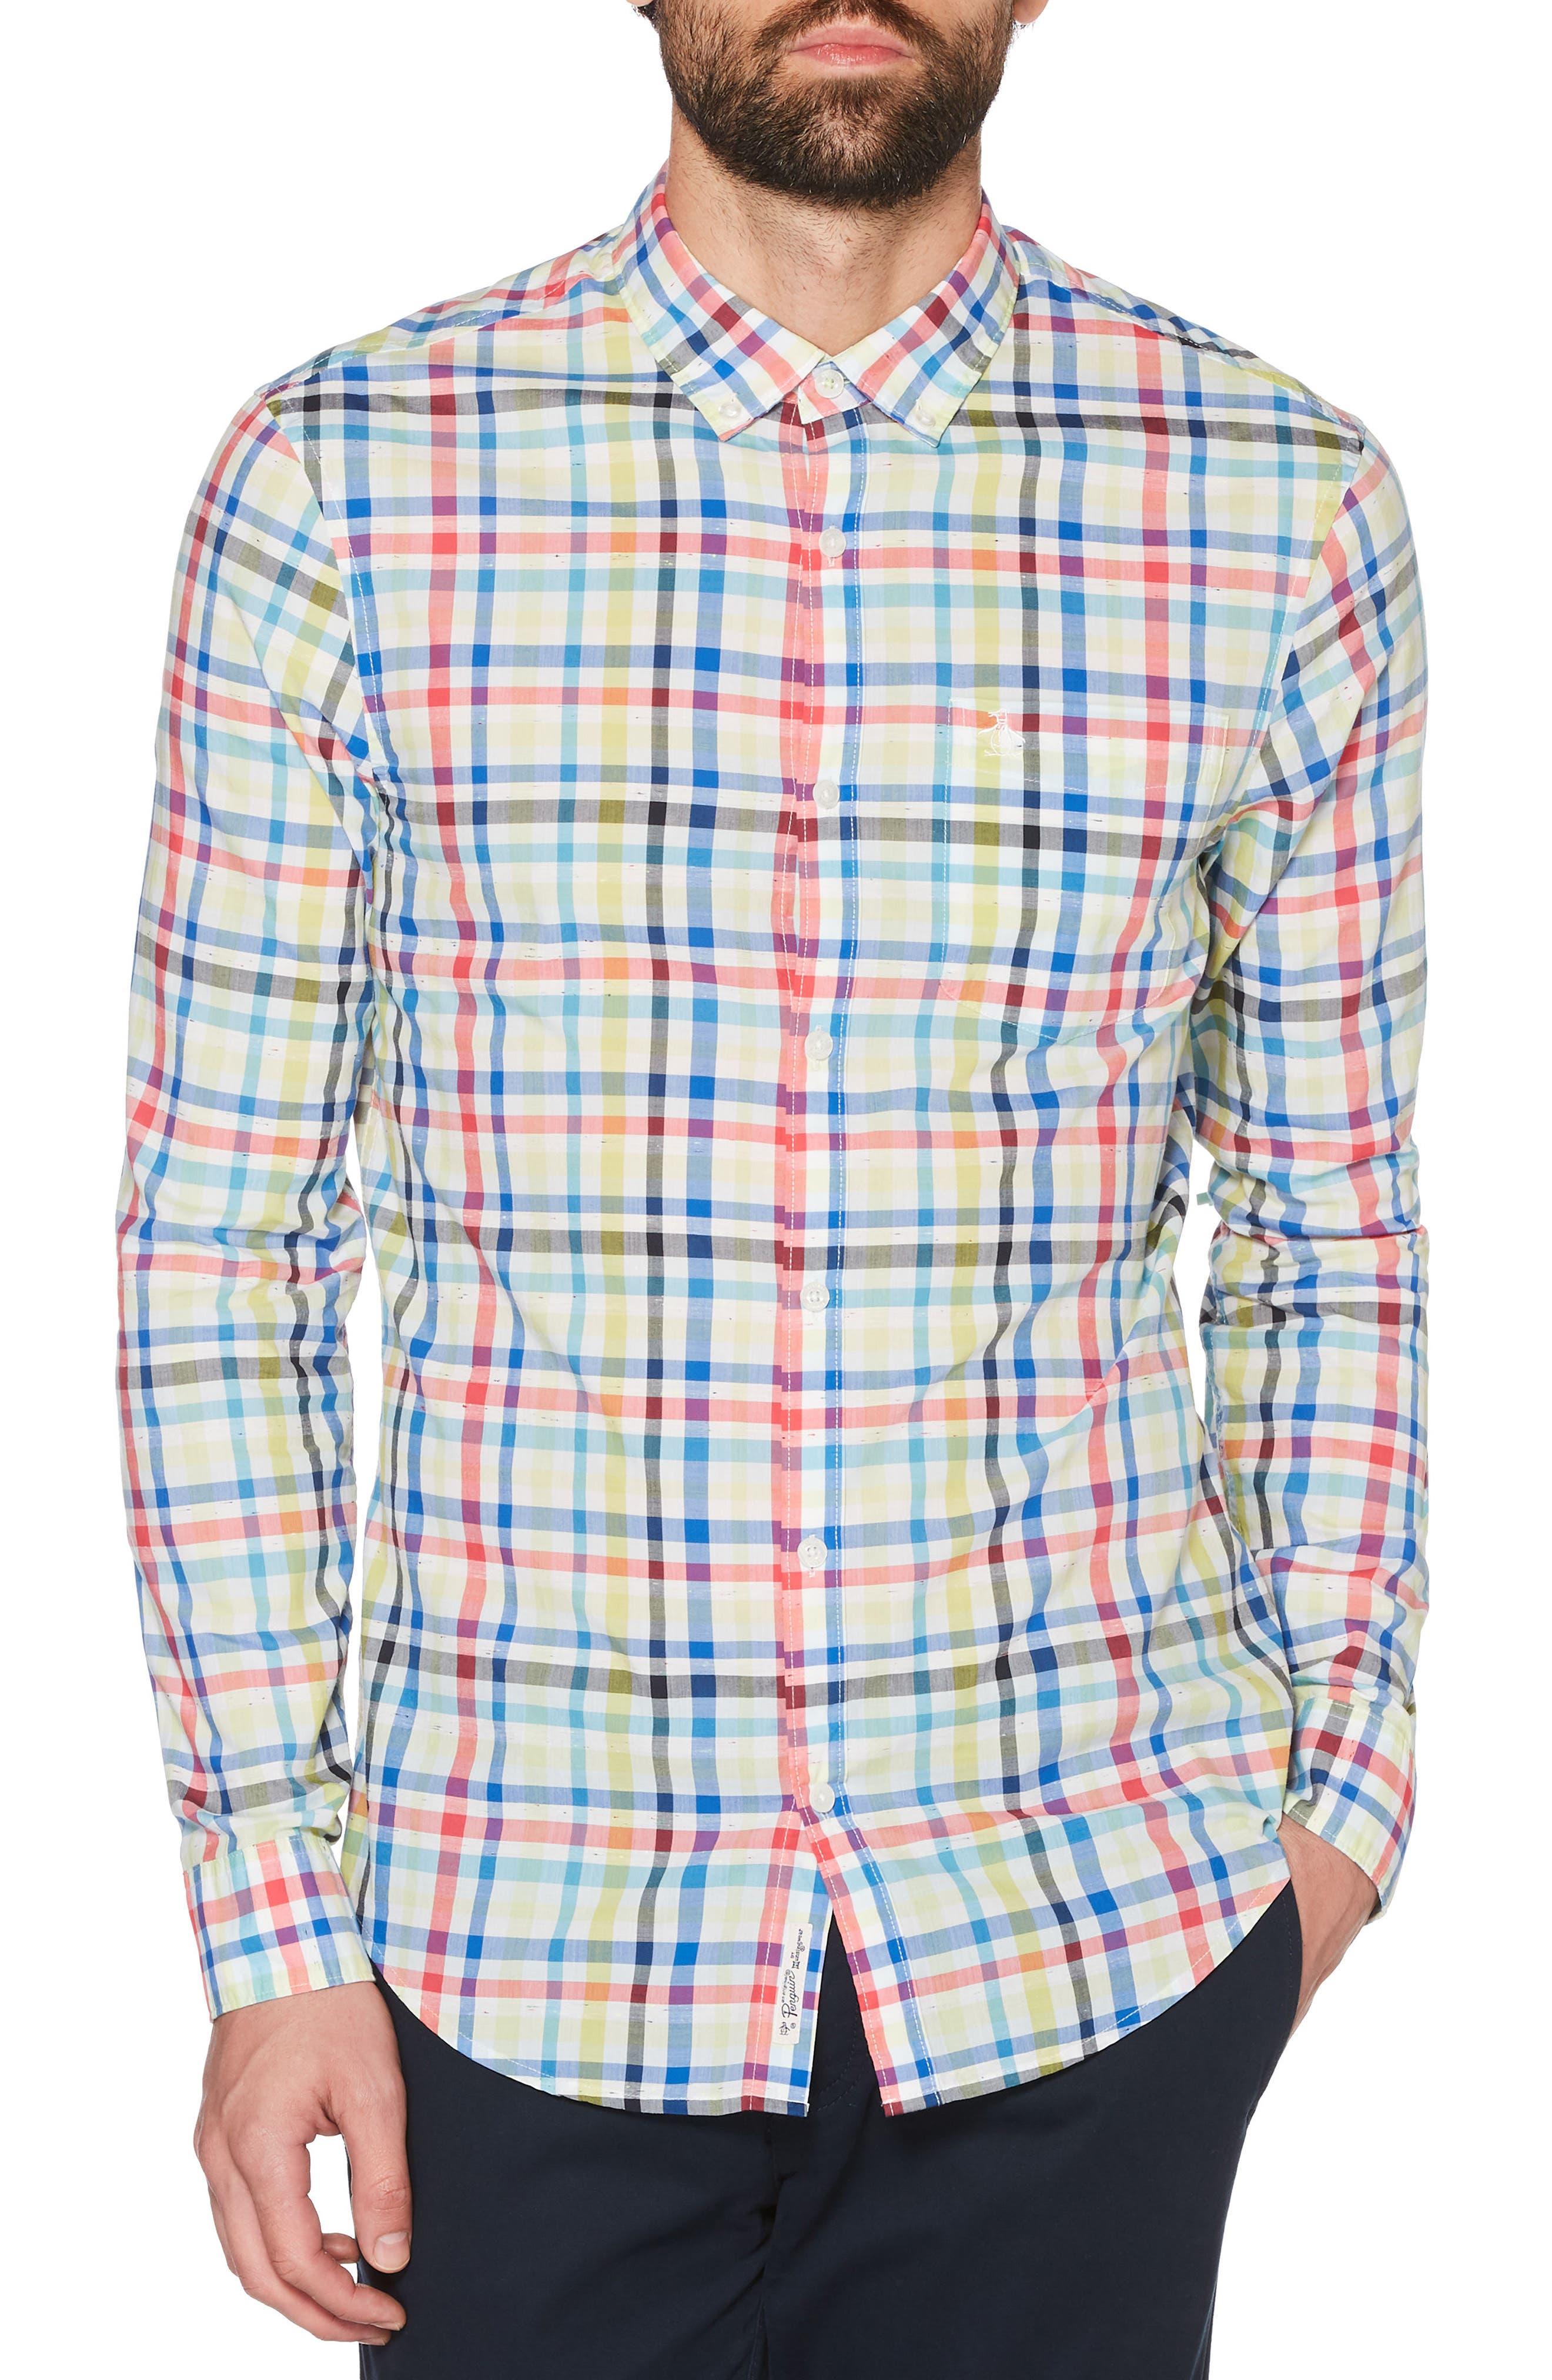 P55 Plaid Woven Shirt,                             Main thumbnail 1, color,                             462